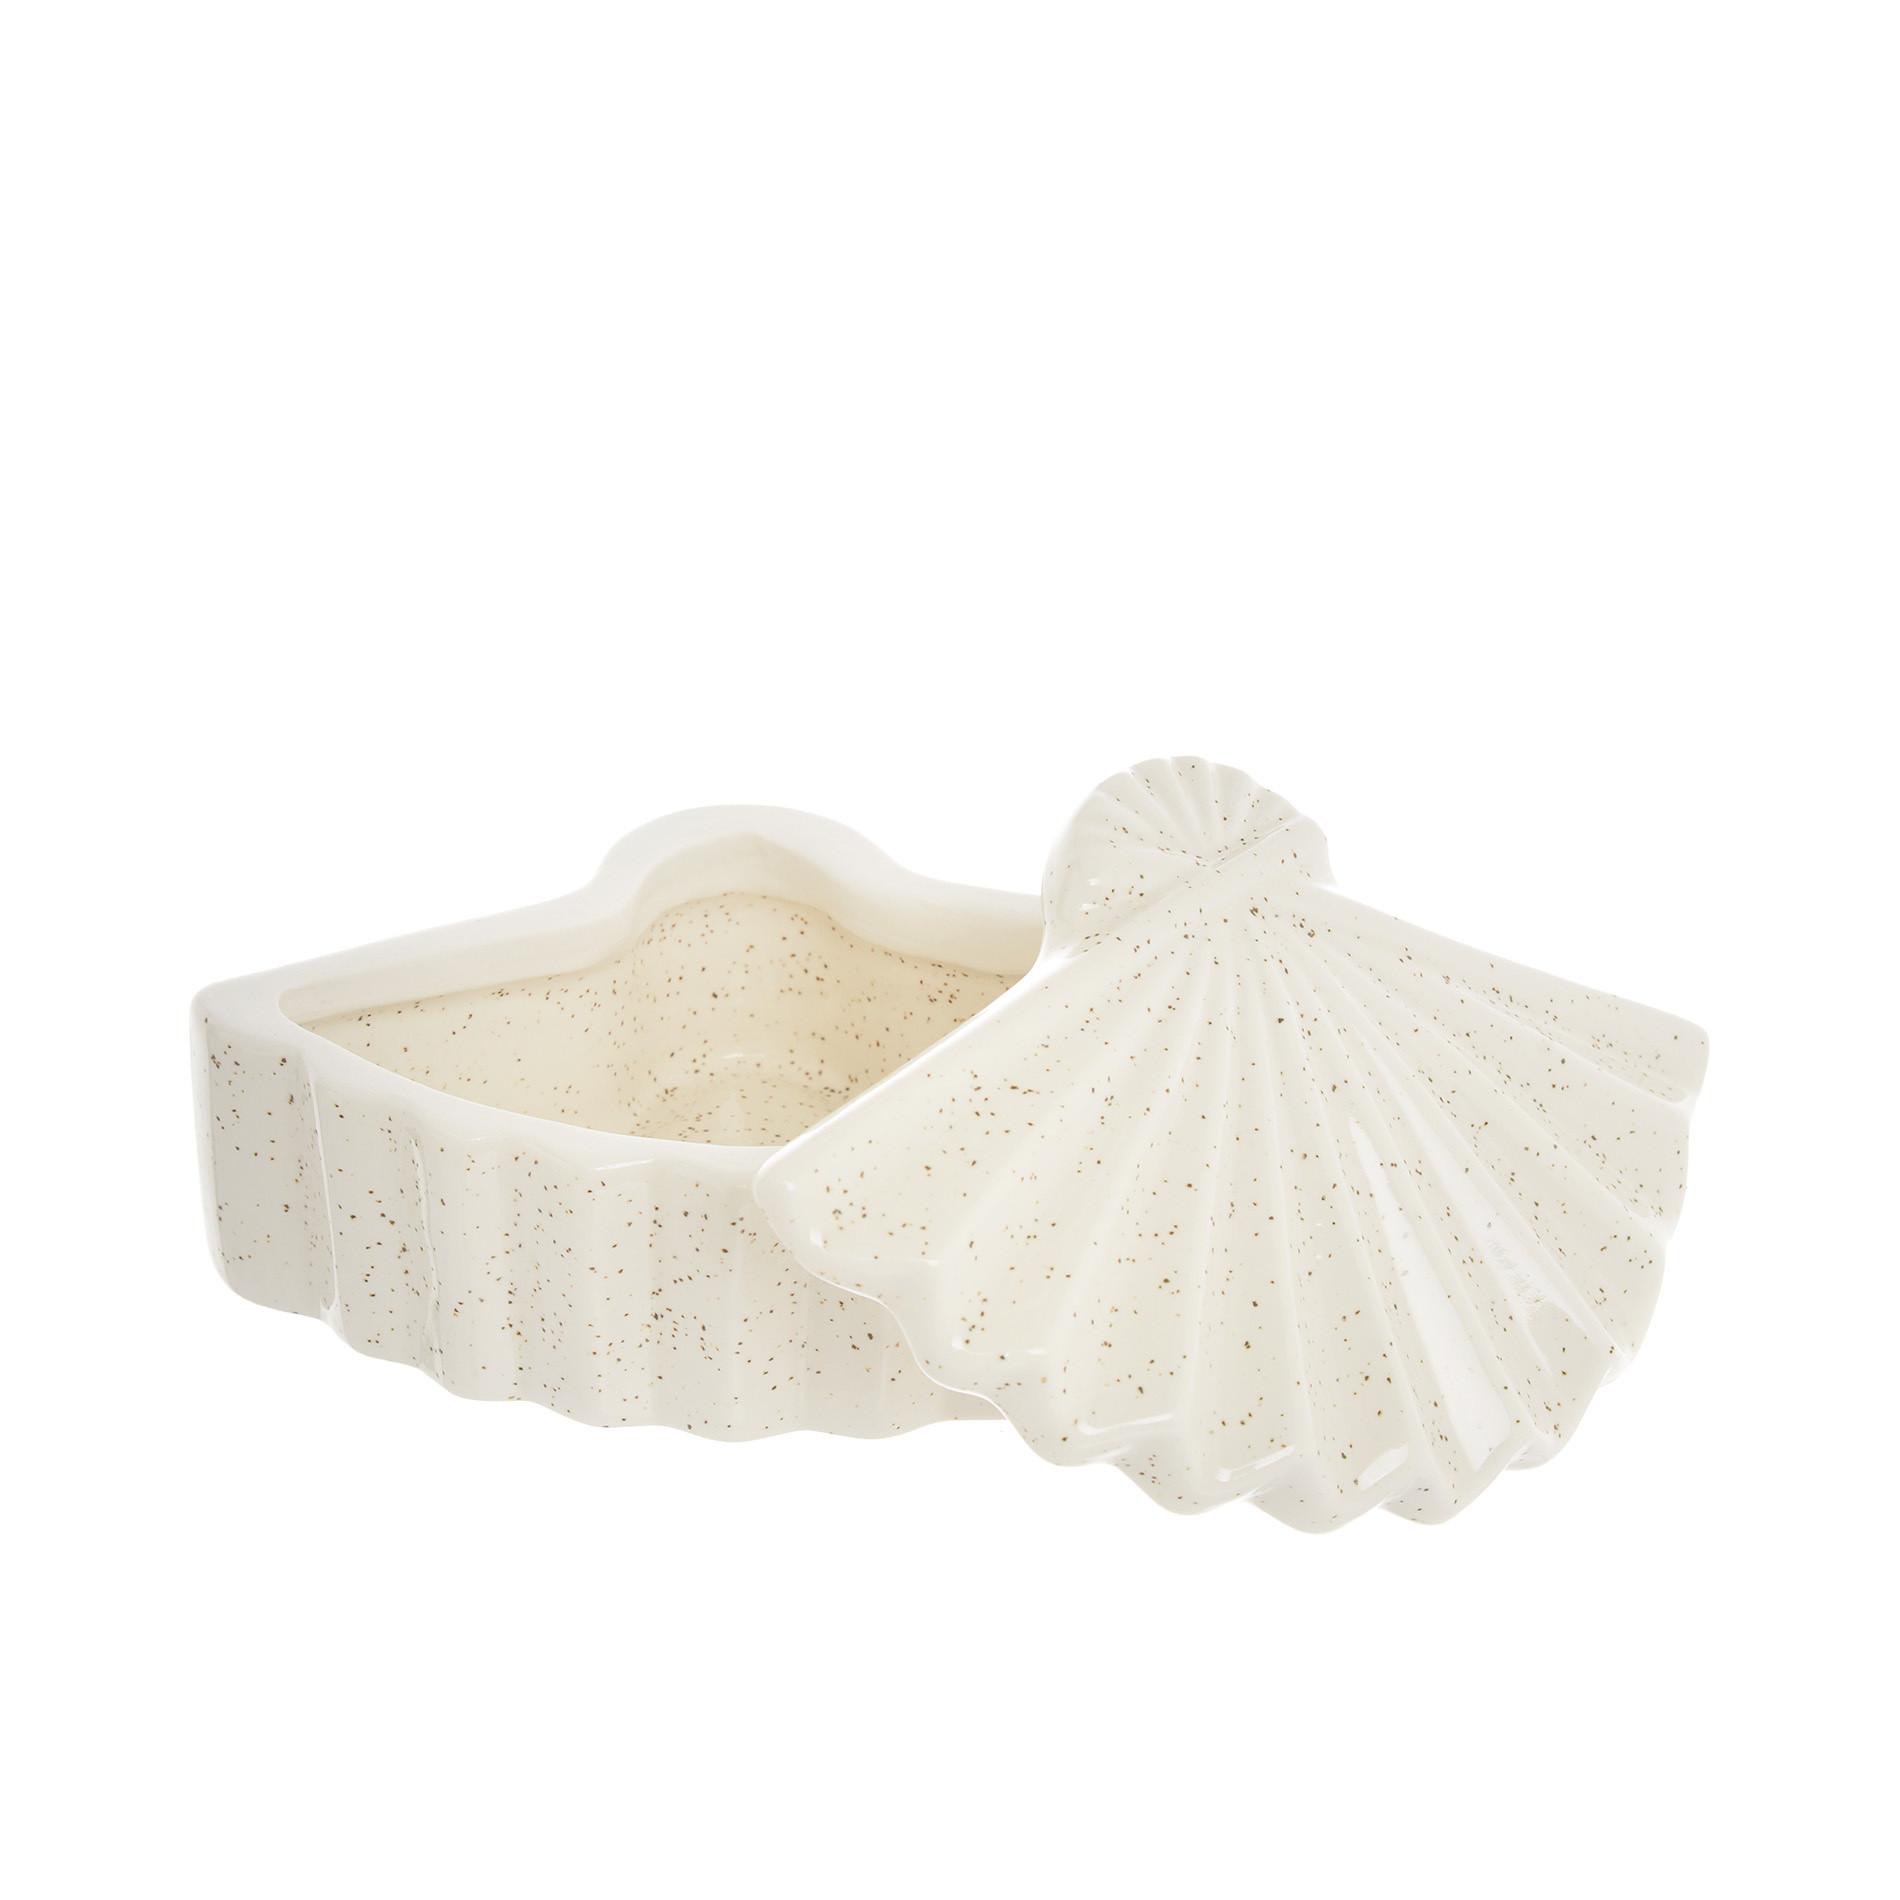 Box decorativo ceramica a ventaglio, Bianco, large image number 1